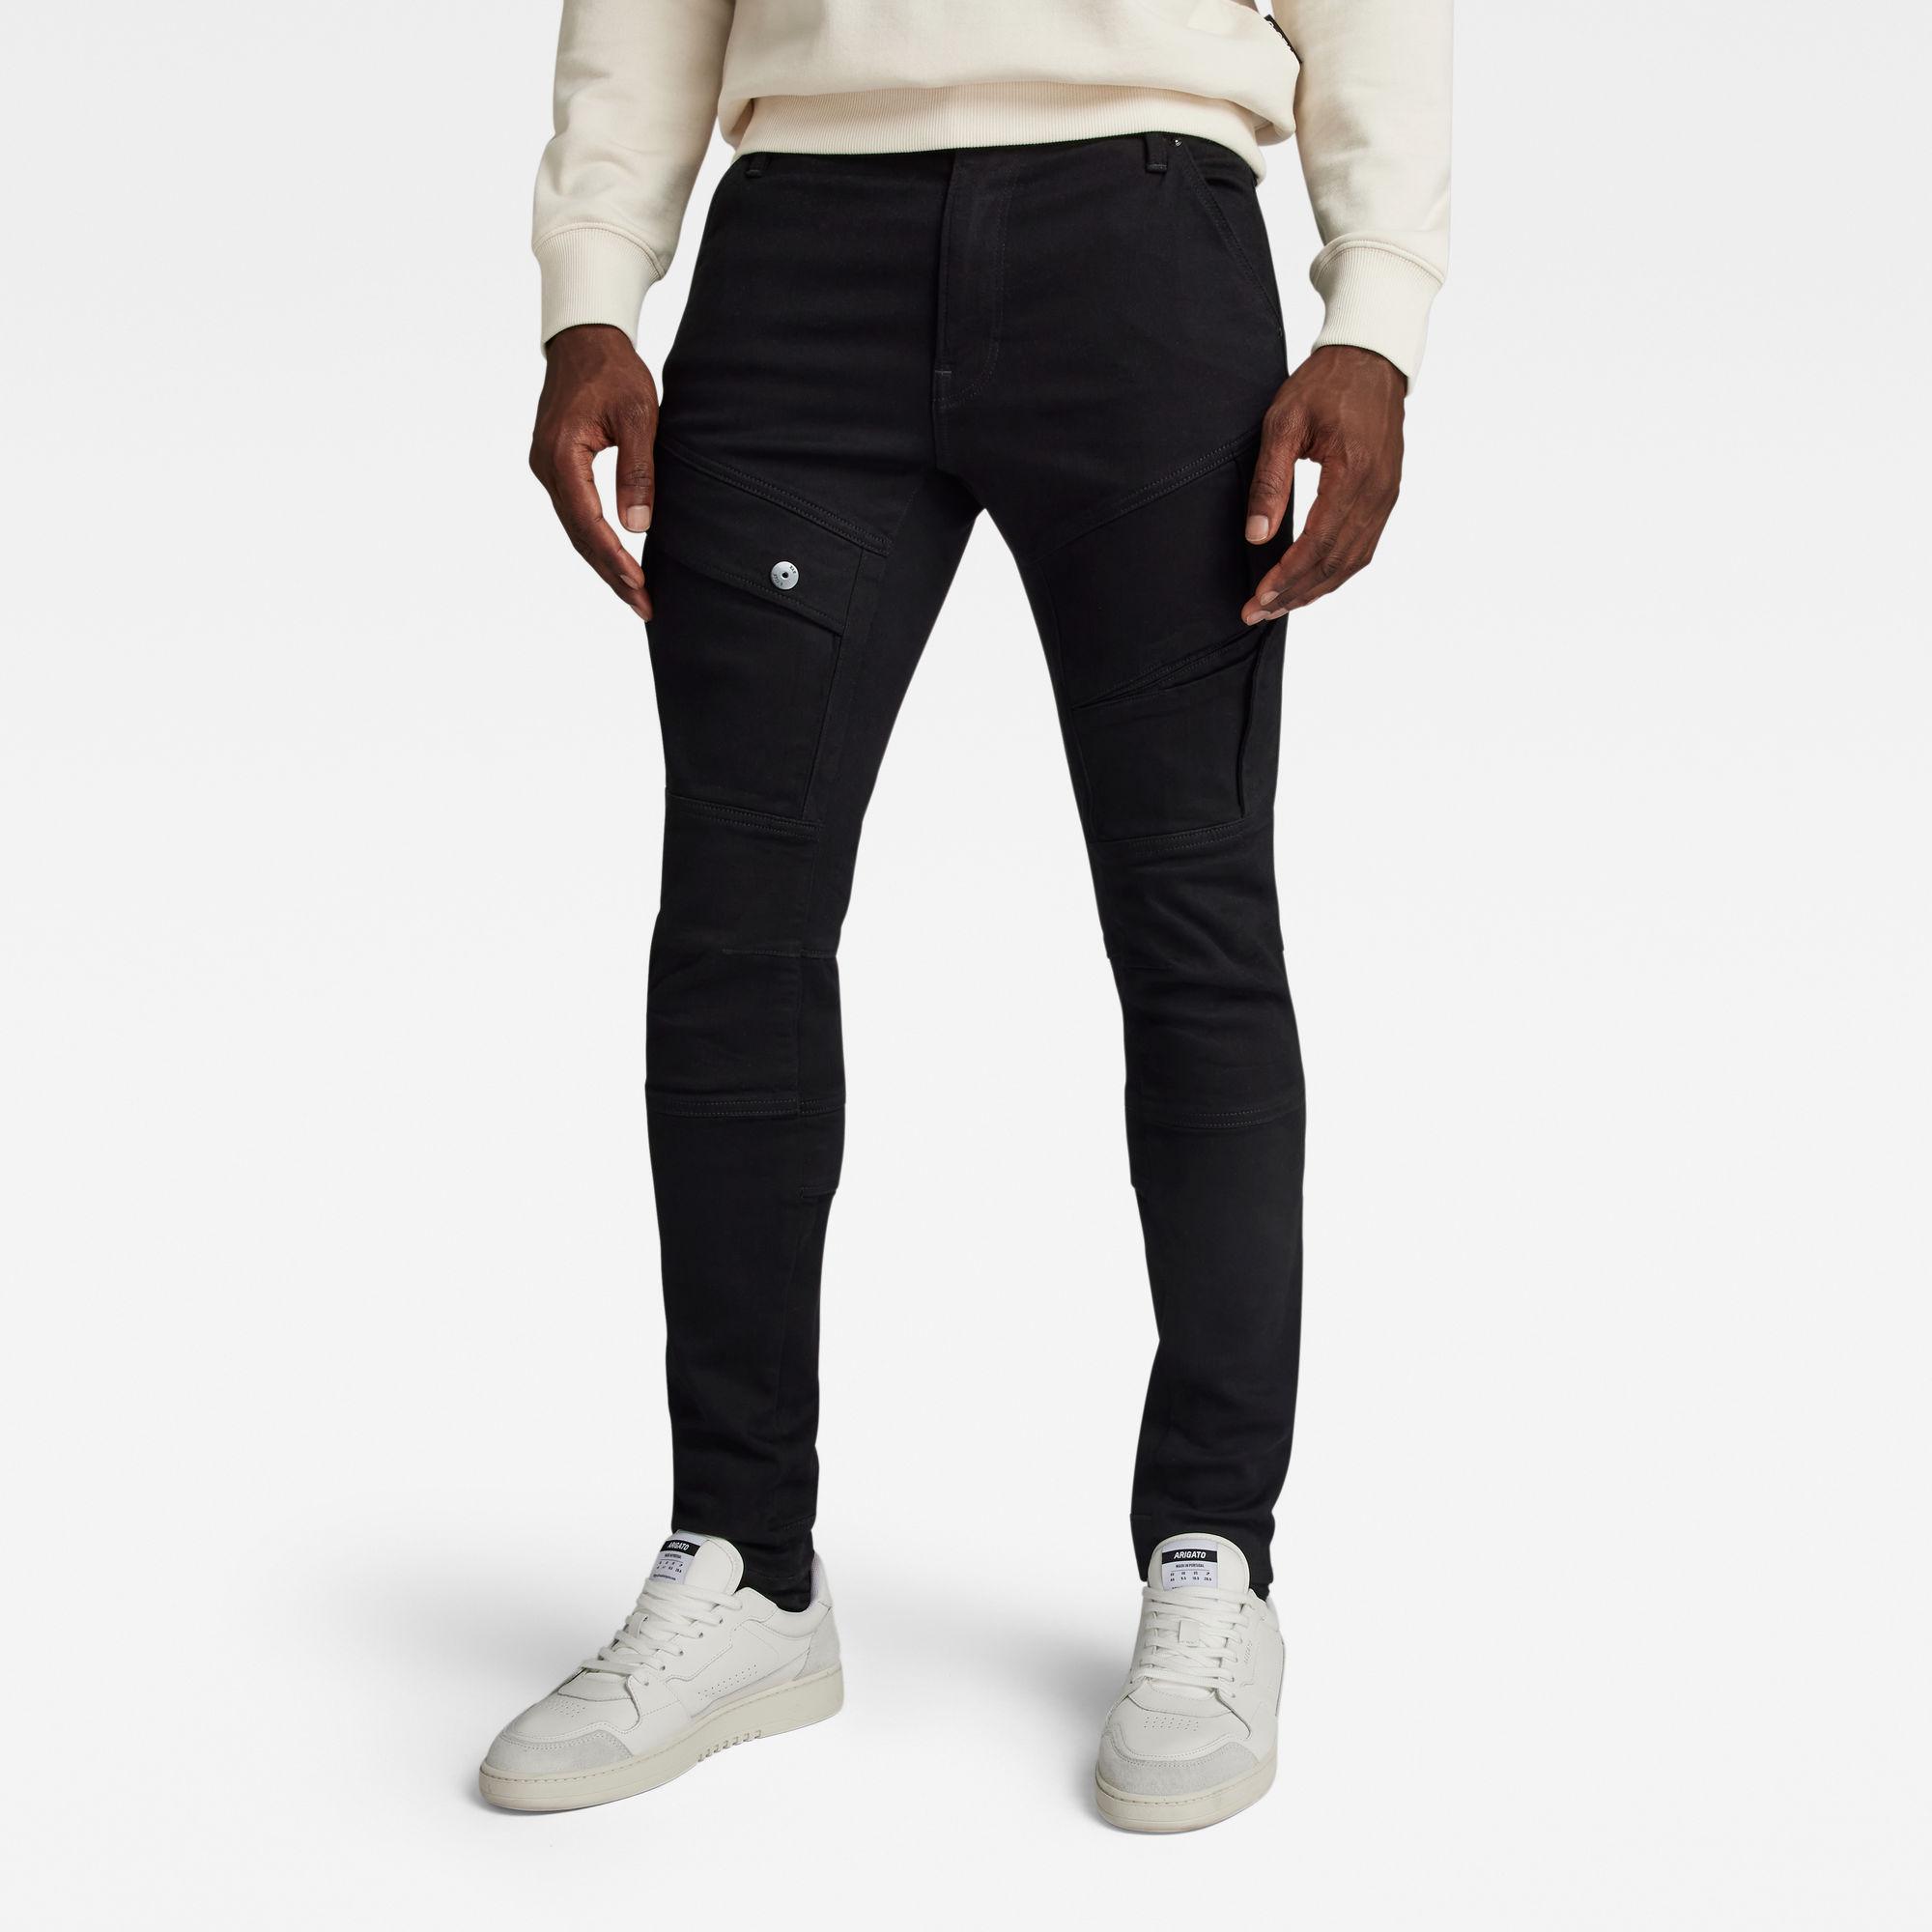 G-Star RAW Heren Airblaze 3D Skinny Jeans Zwart